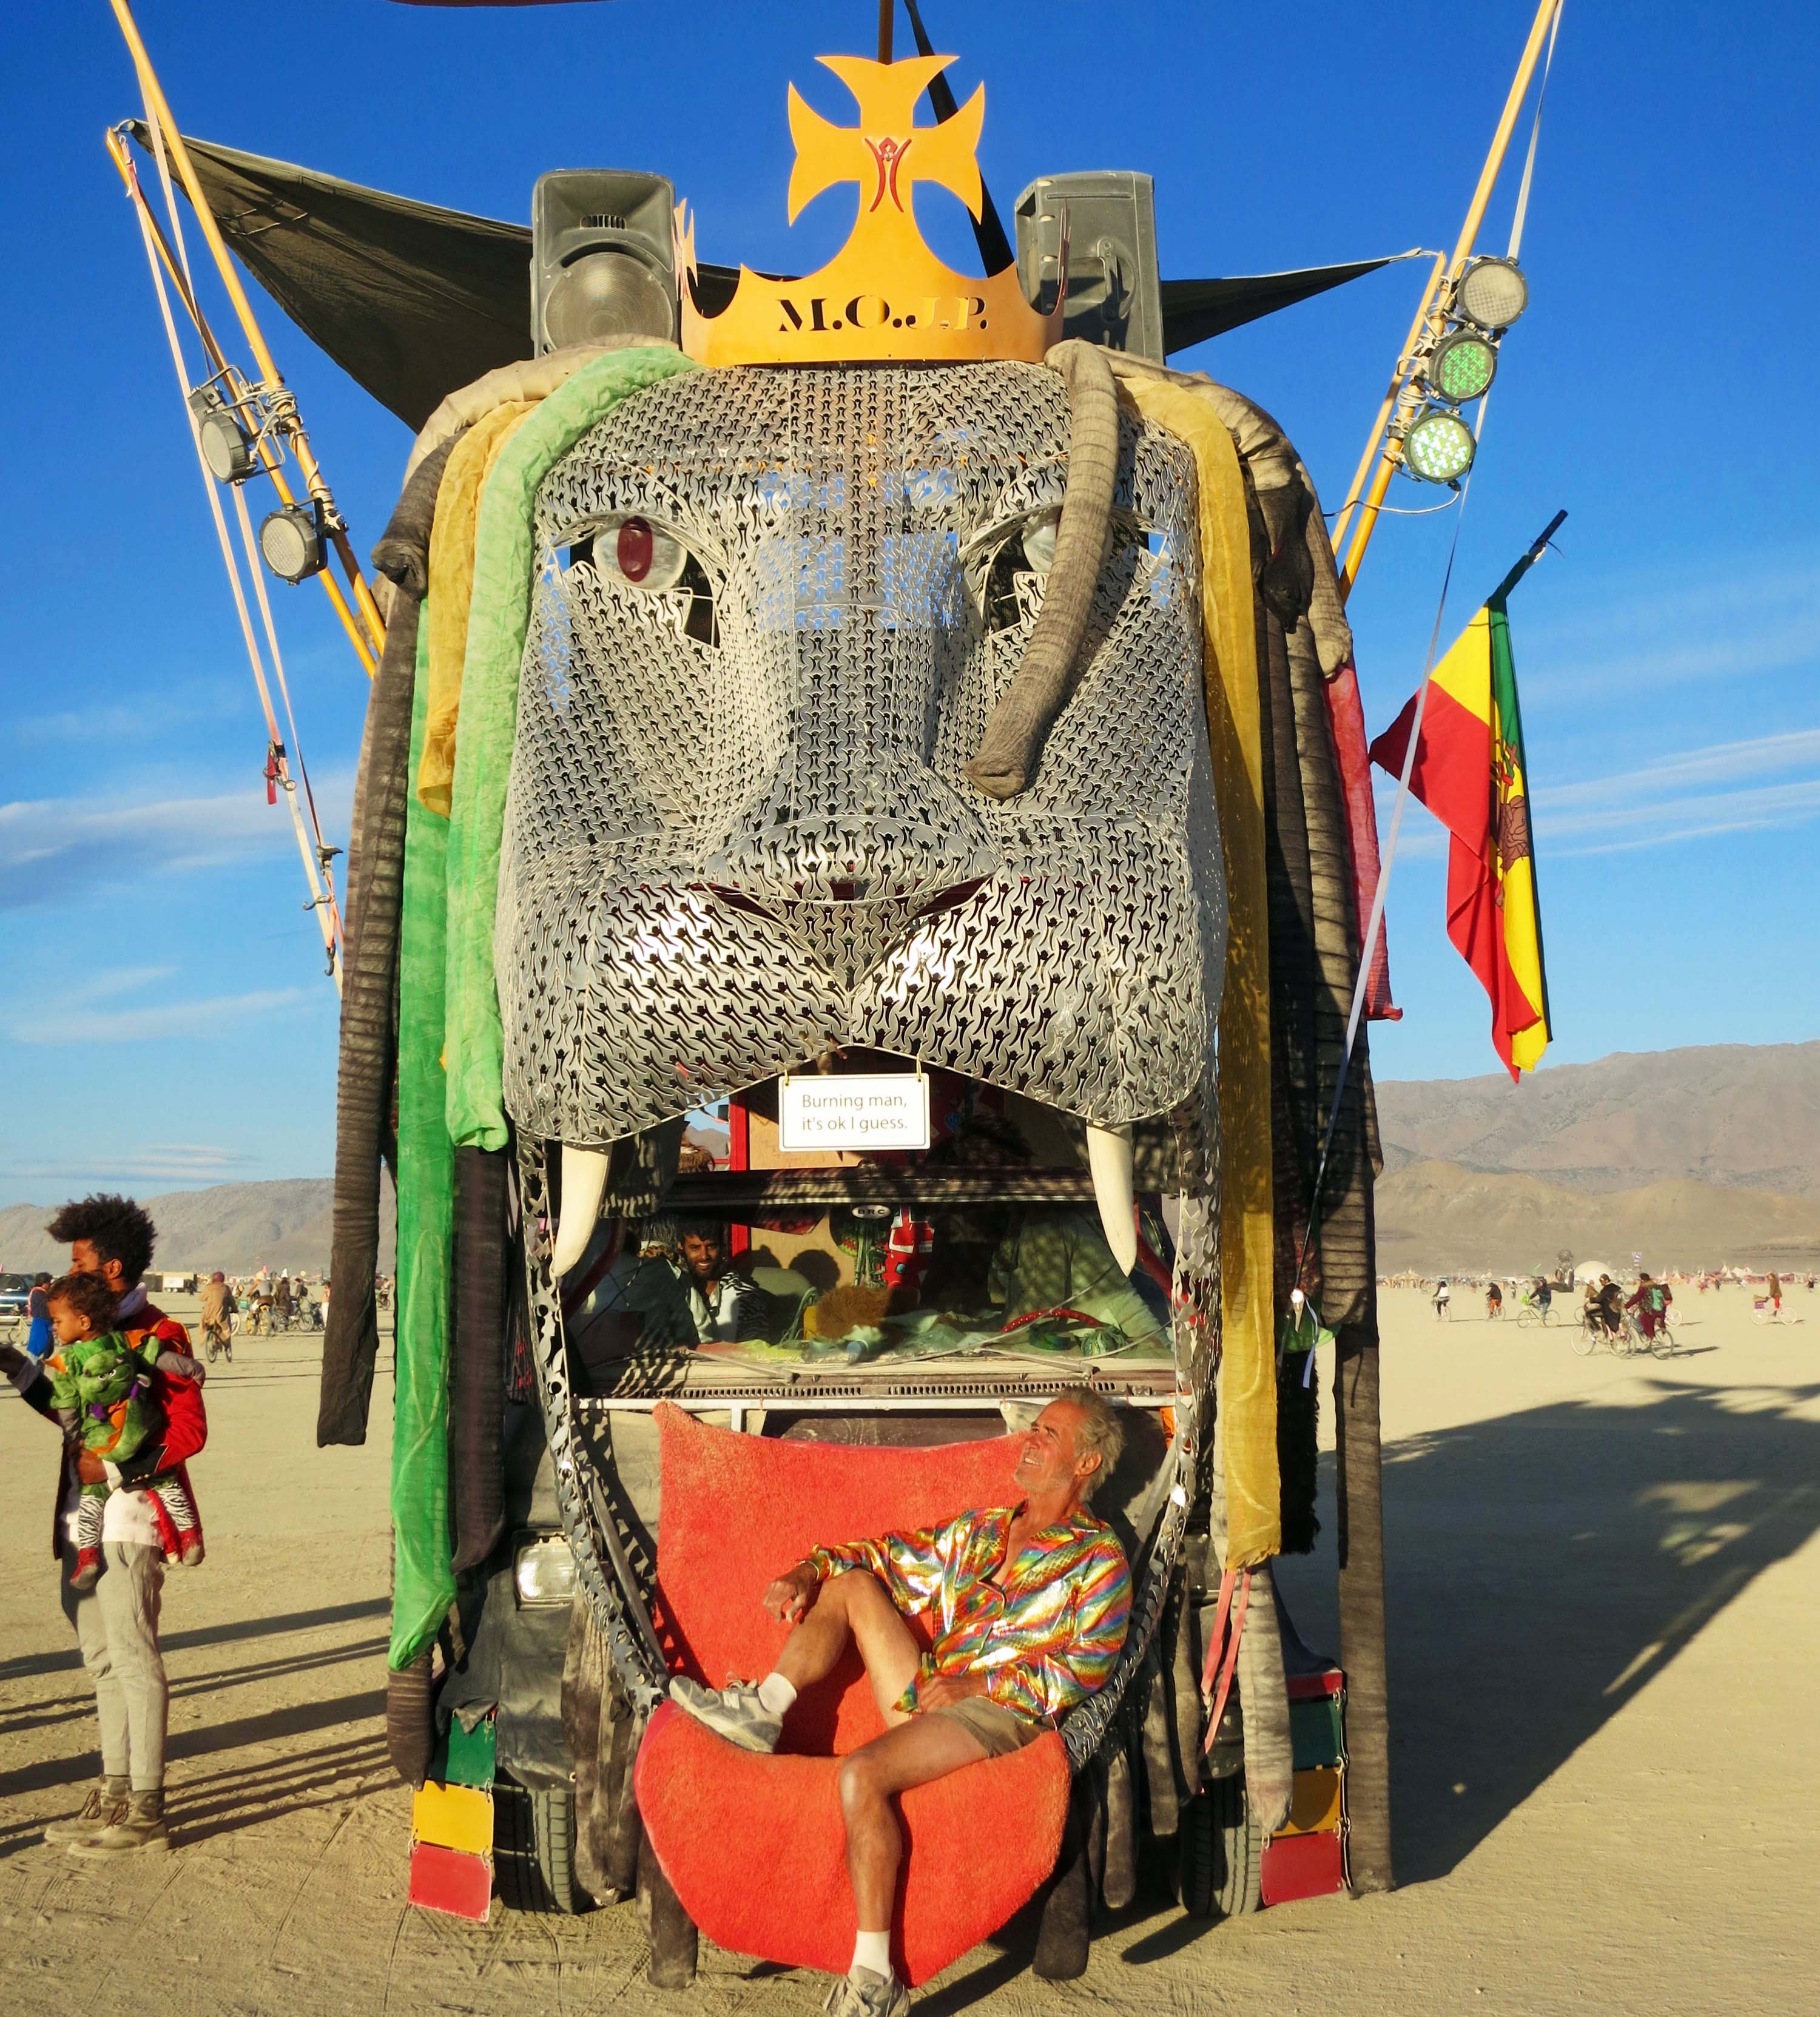 6 King of Beasts 2 Mutant Vehicle at Burning Man 2015